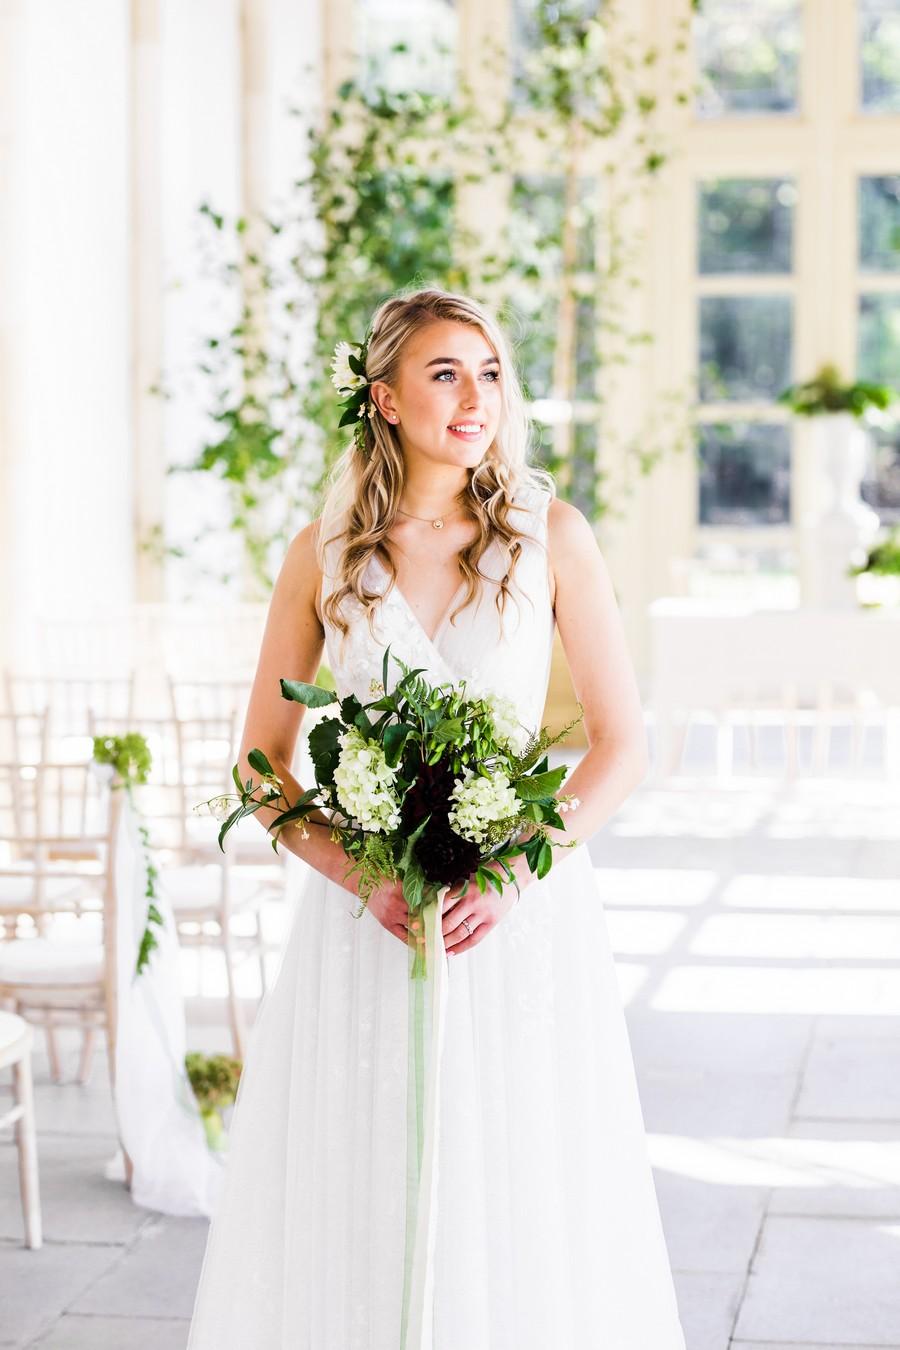 Highcliffe Castle wedding inspiration on the English Wedding Blog (20)